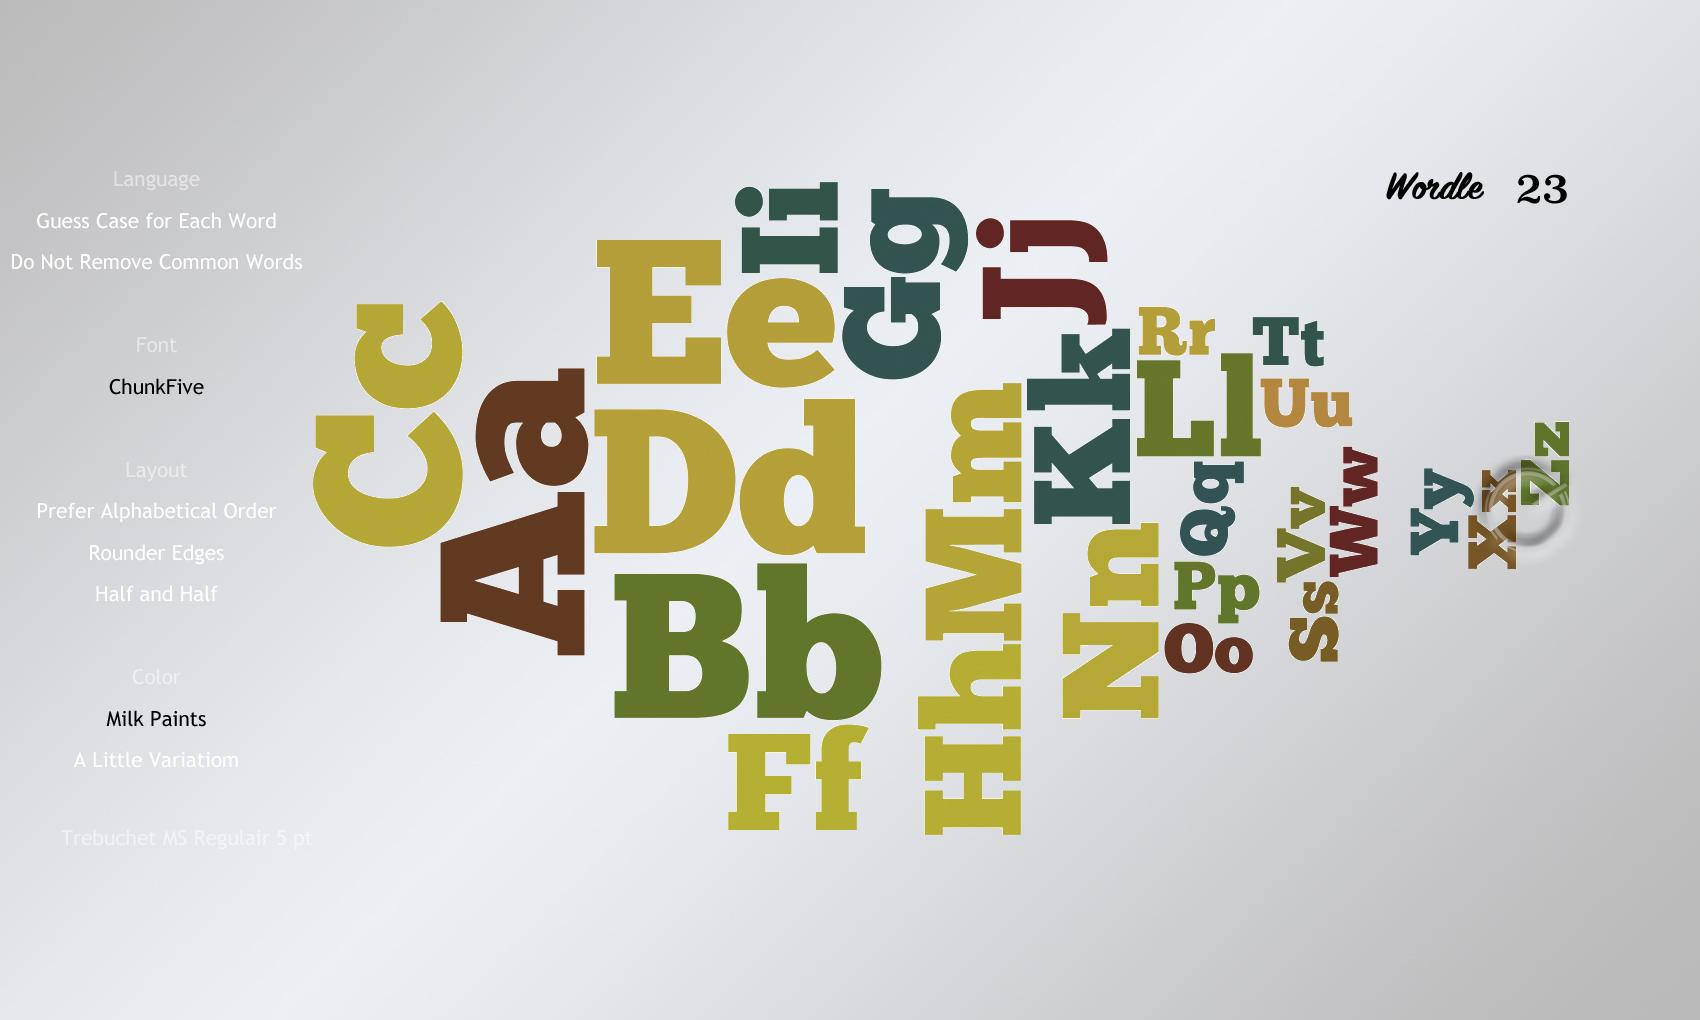 Wordle23 ChunkFive